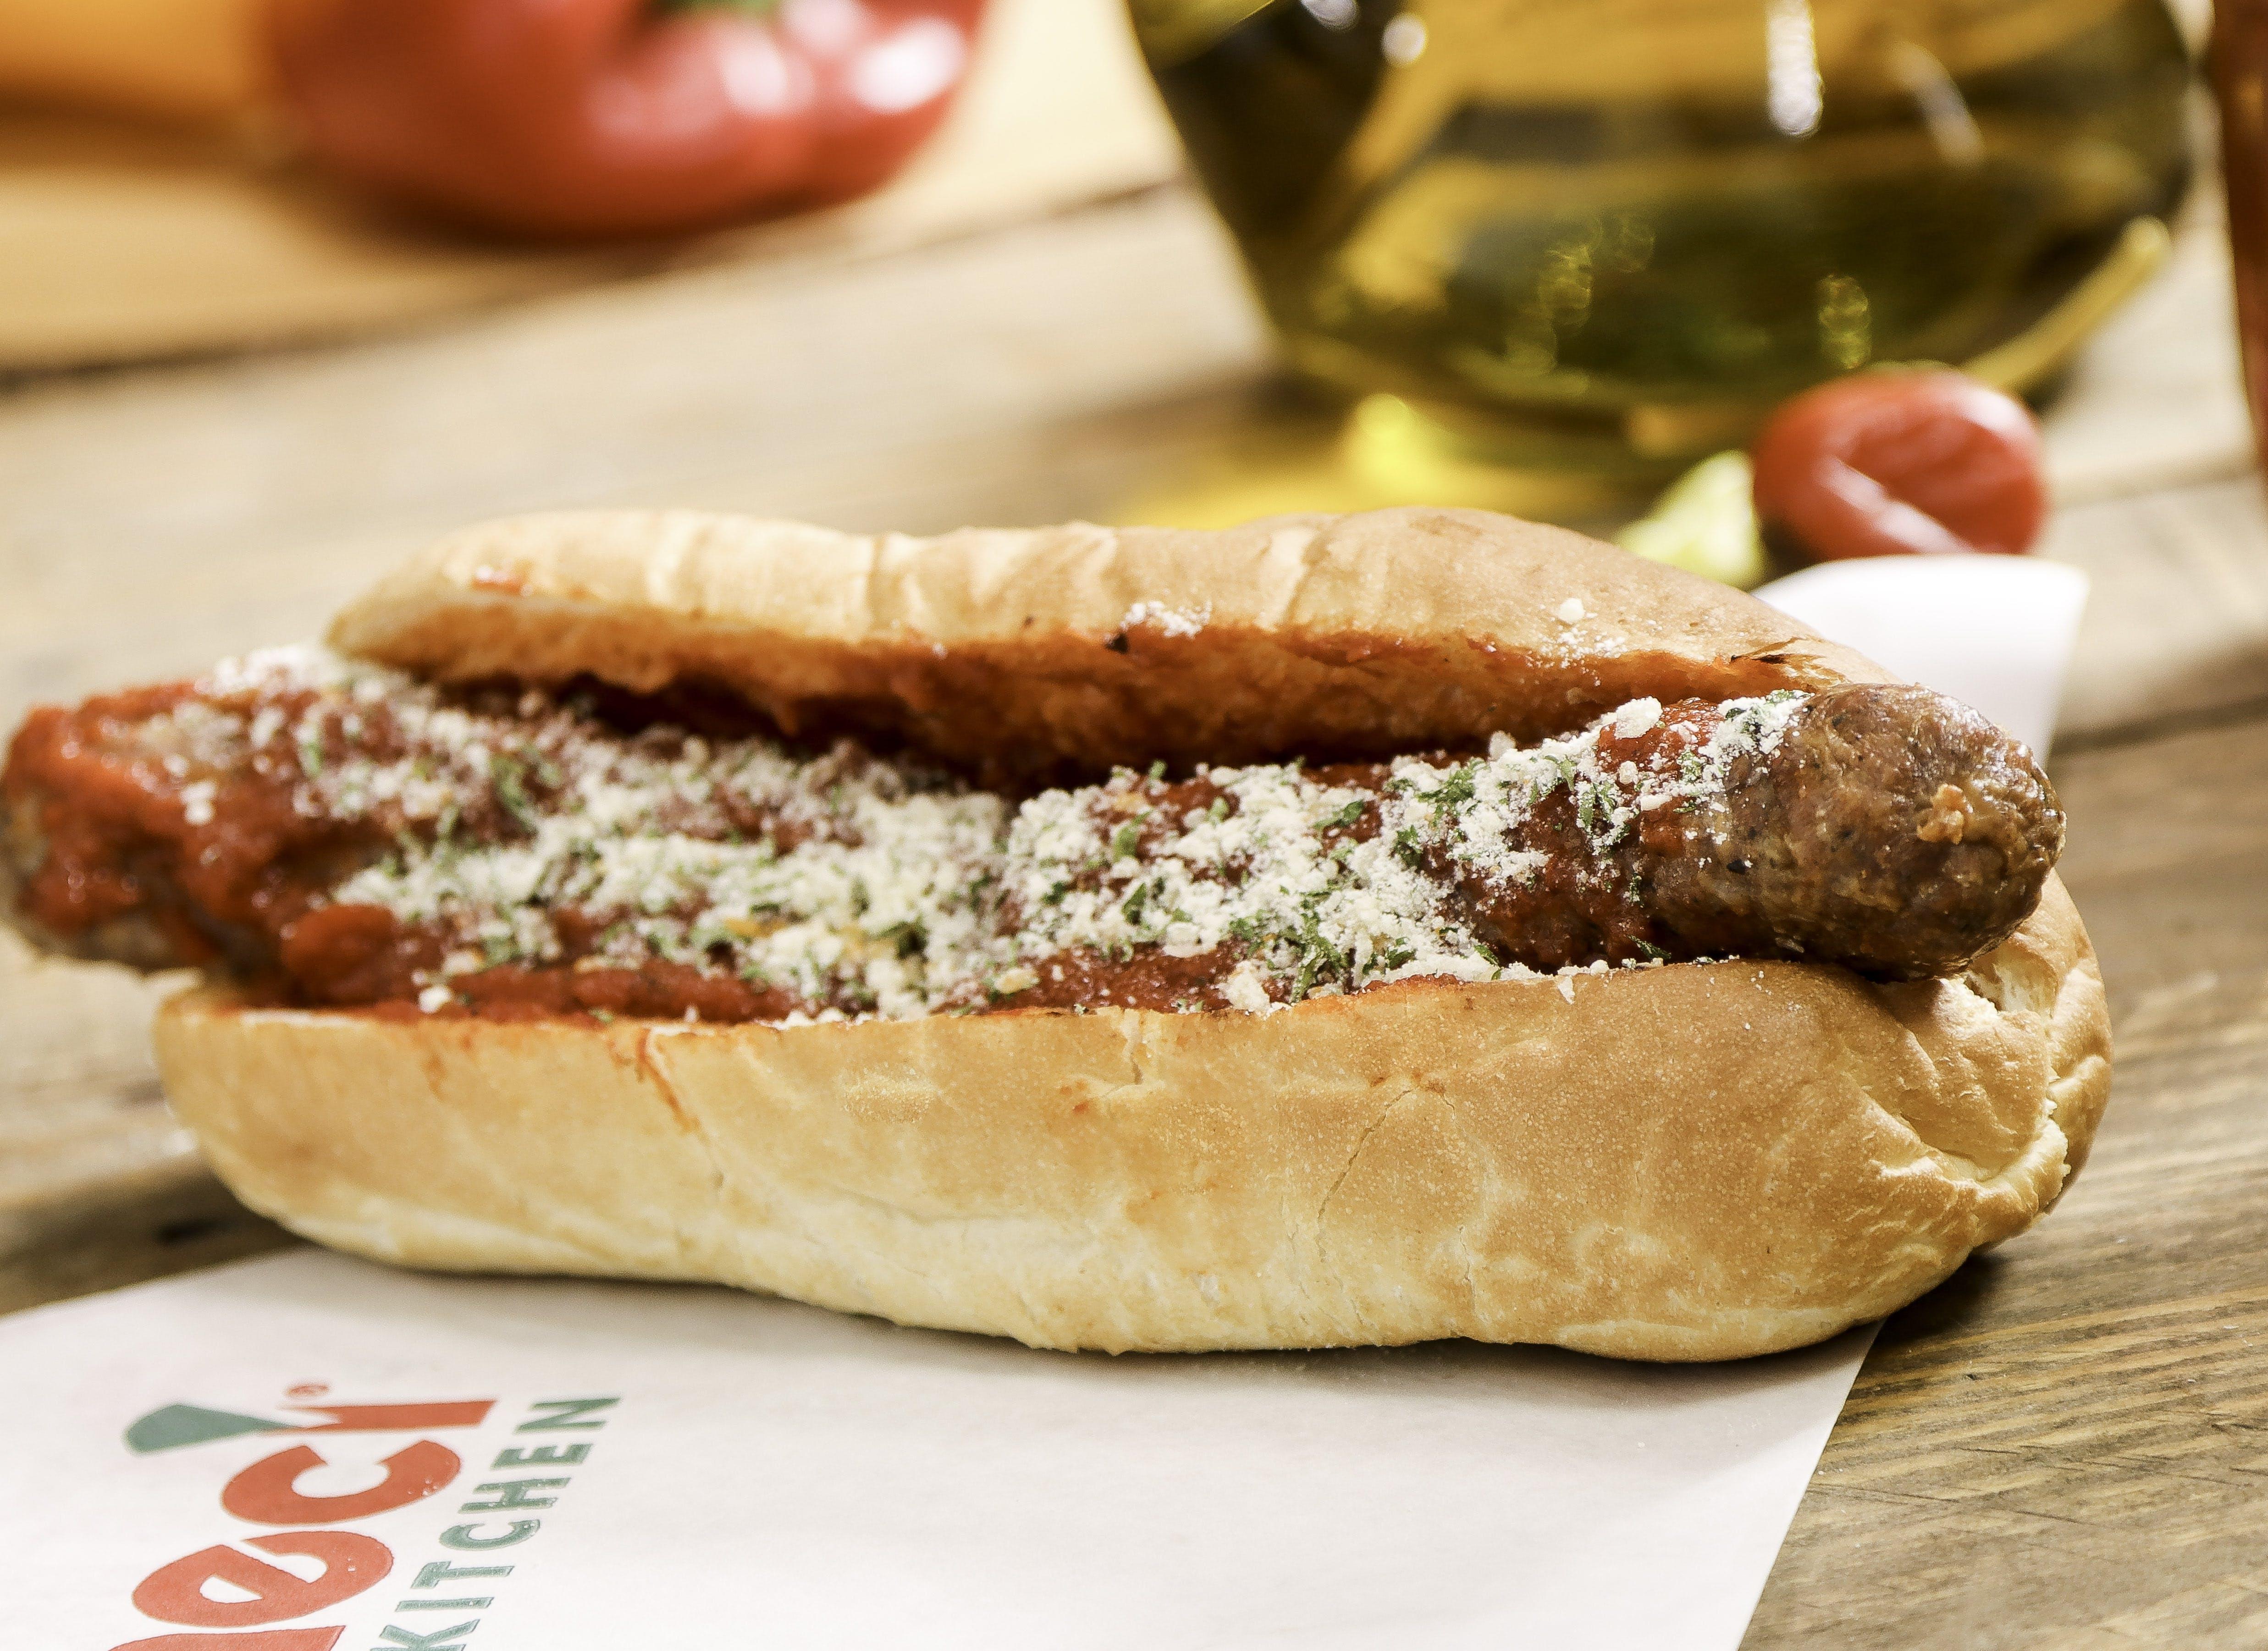 Sausage Sandwich from Ameci Pizza & Pasta - Irvine in Irvine, CA